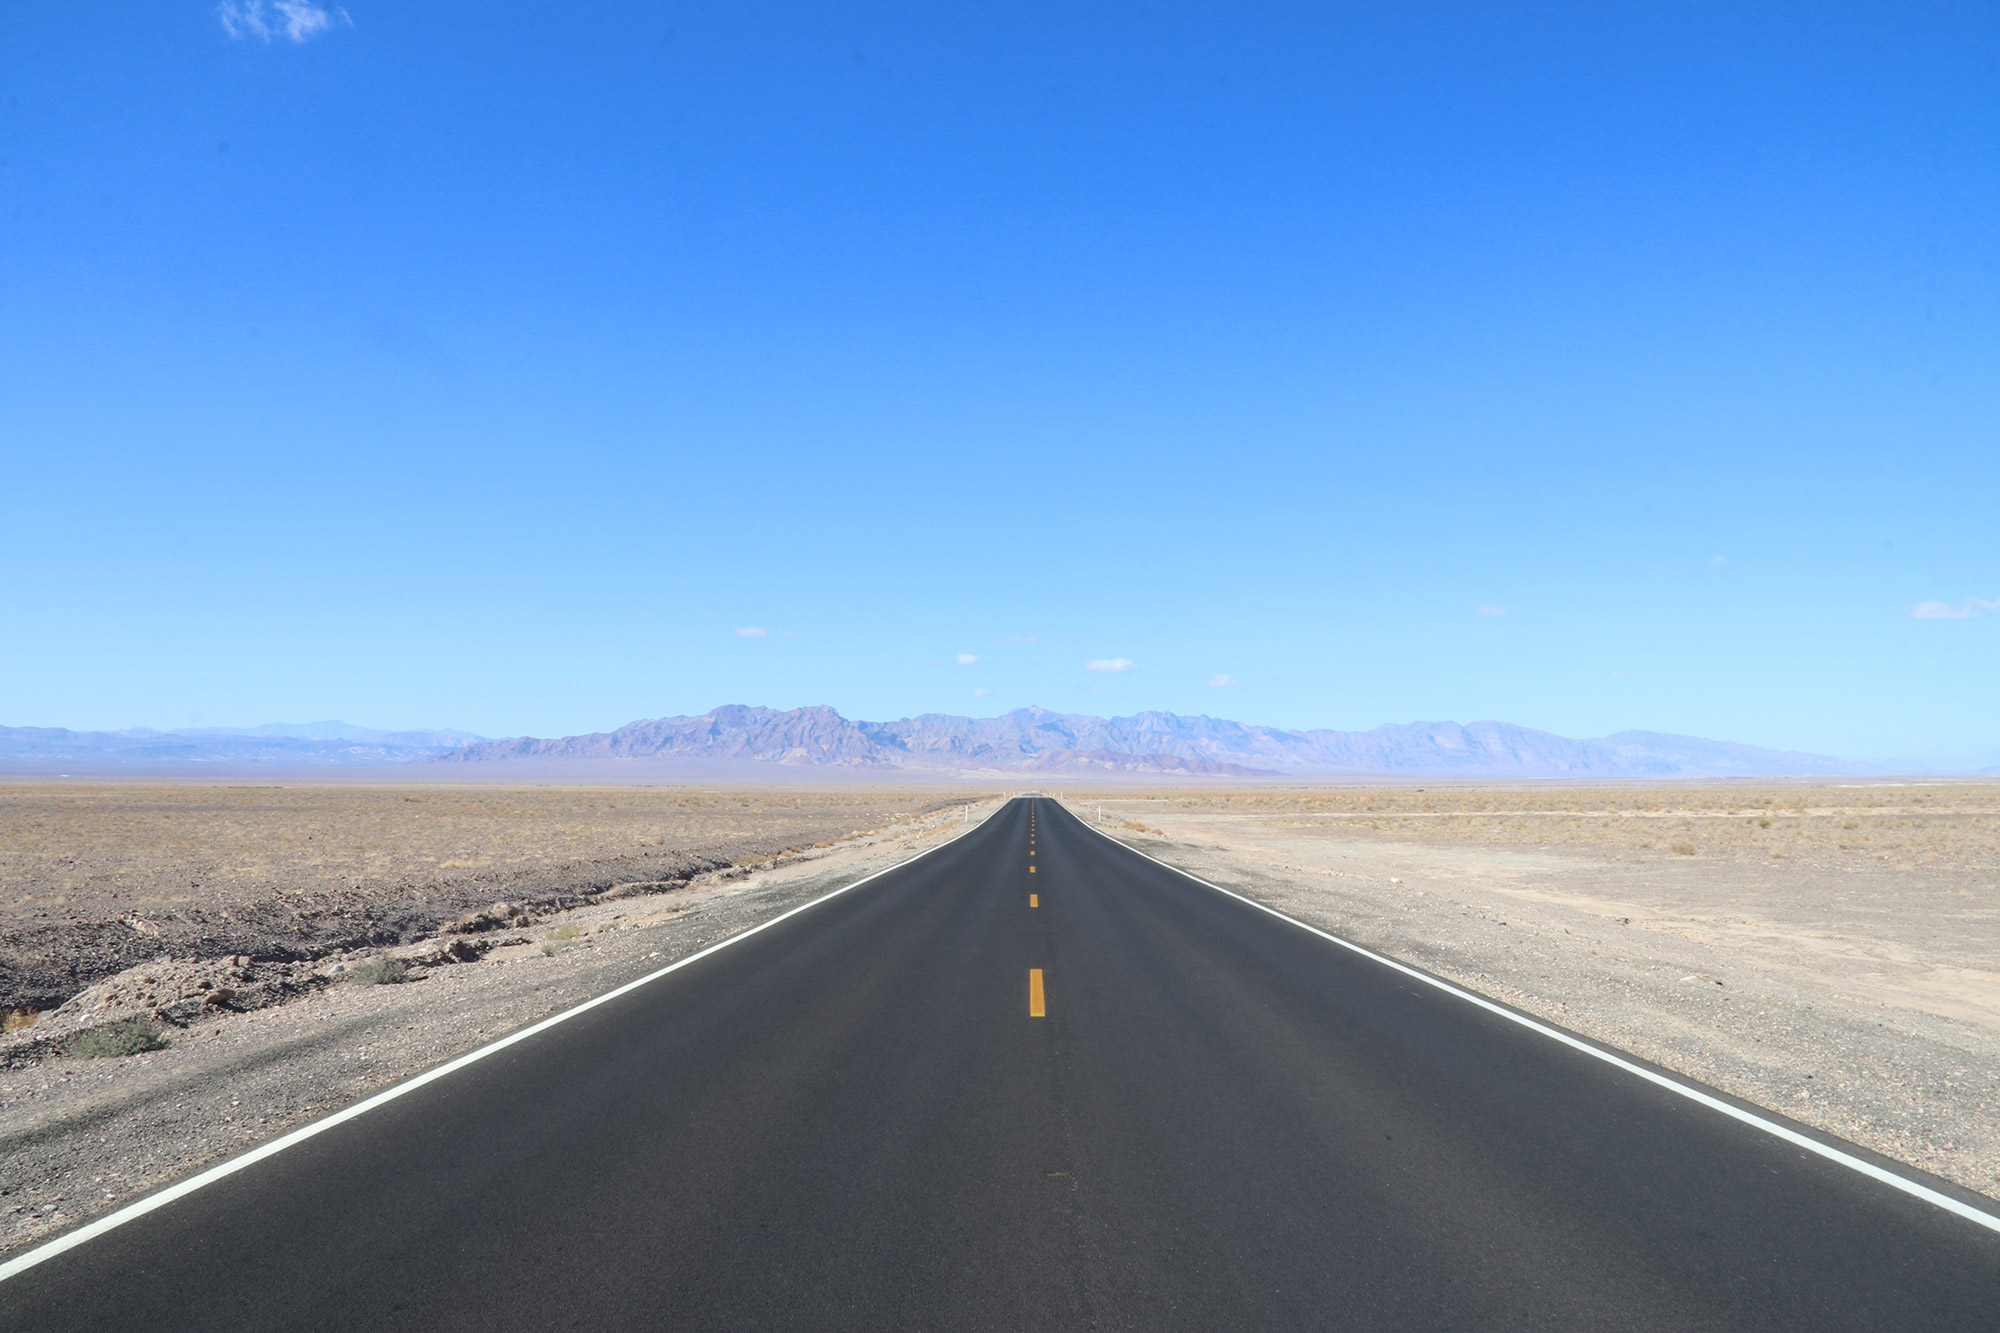 Amerika dag 18 - Onderweg naar Death Valley National Park